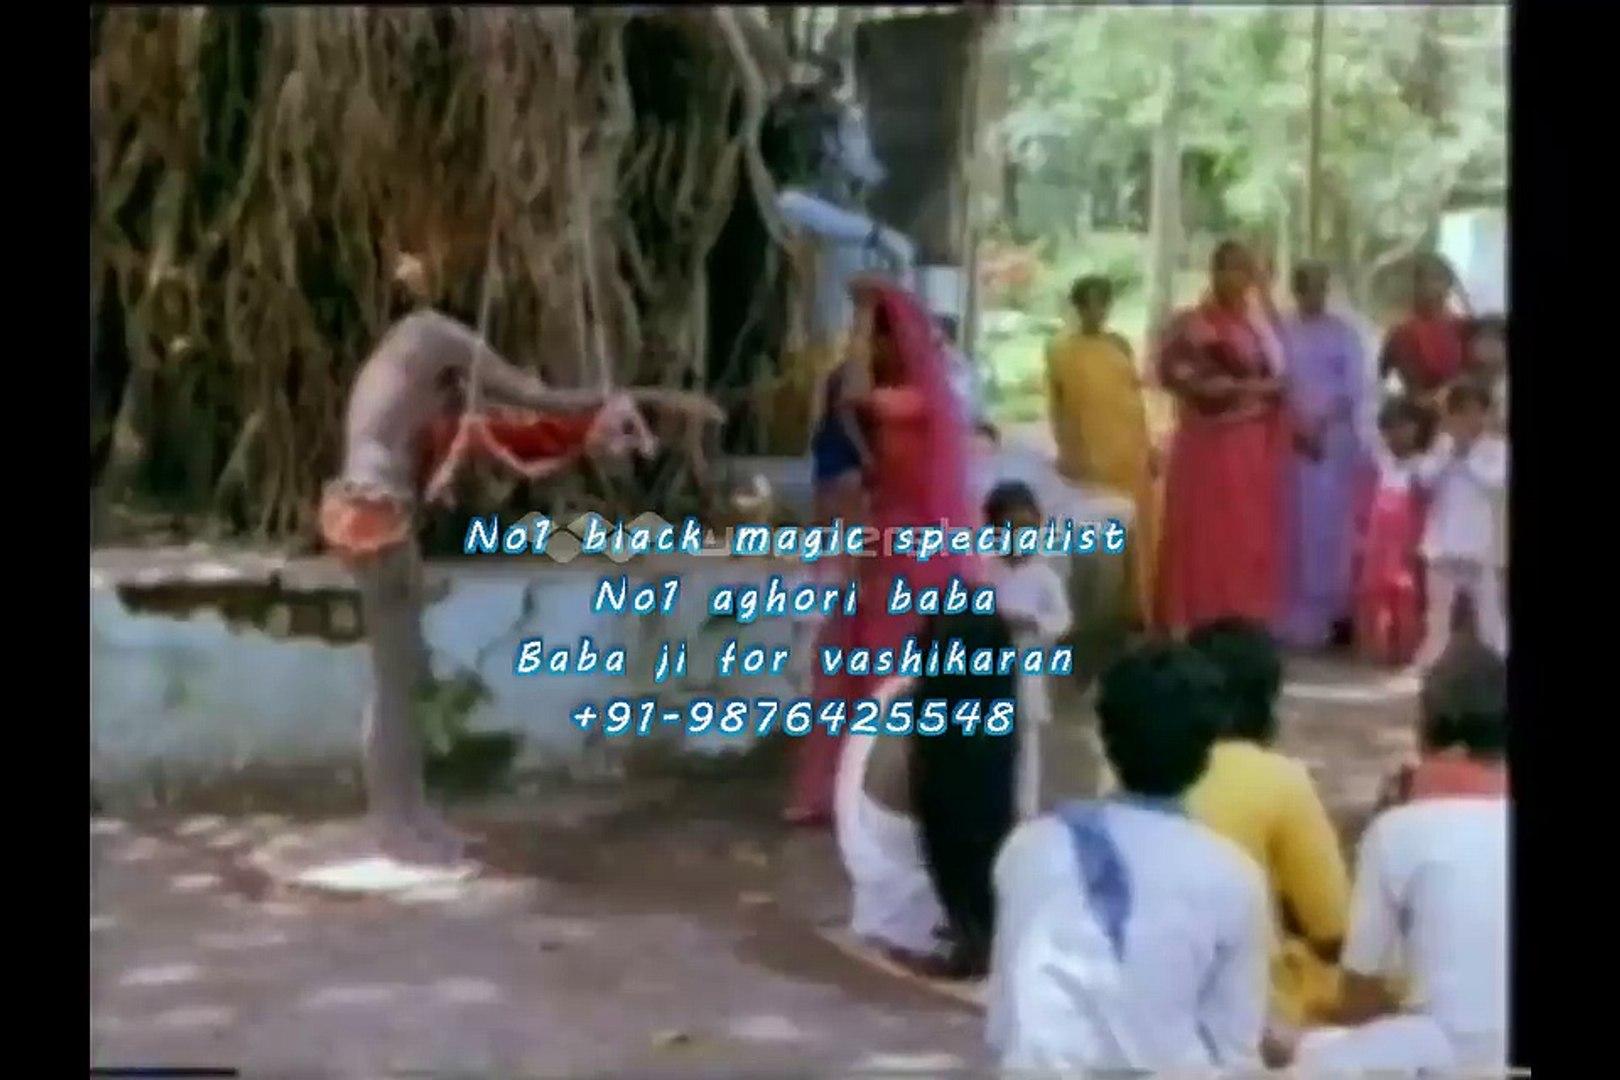 Black magic performed by Aghori baba - Haridwar +91-9876425548